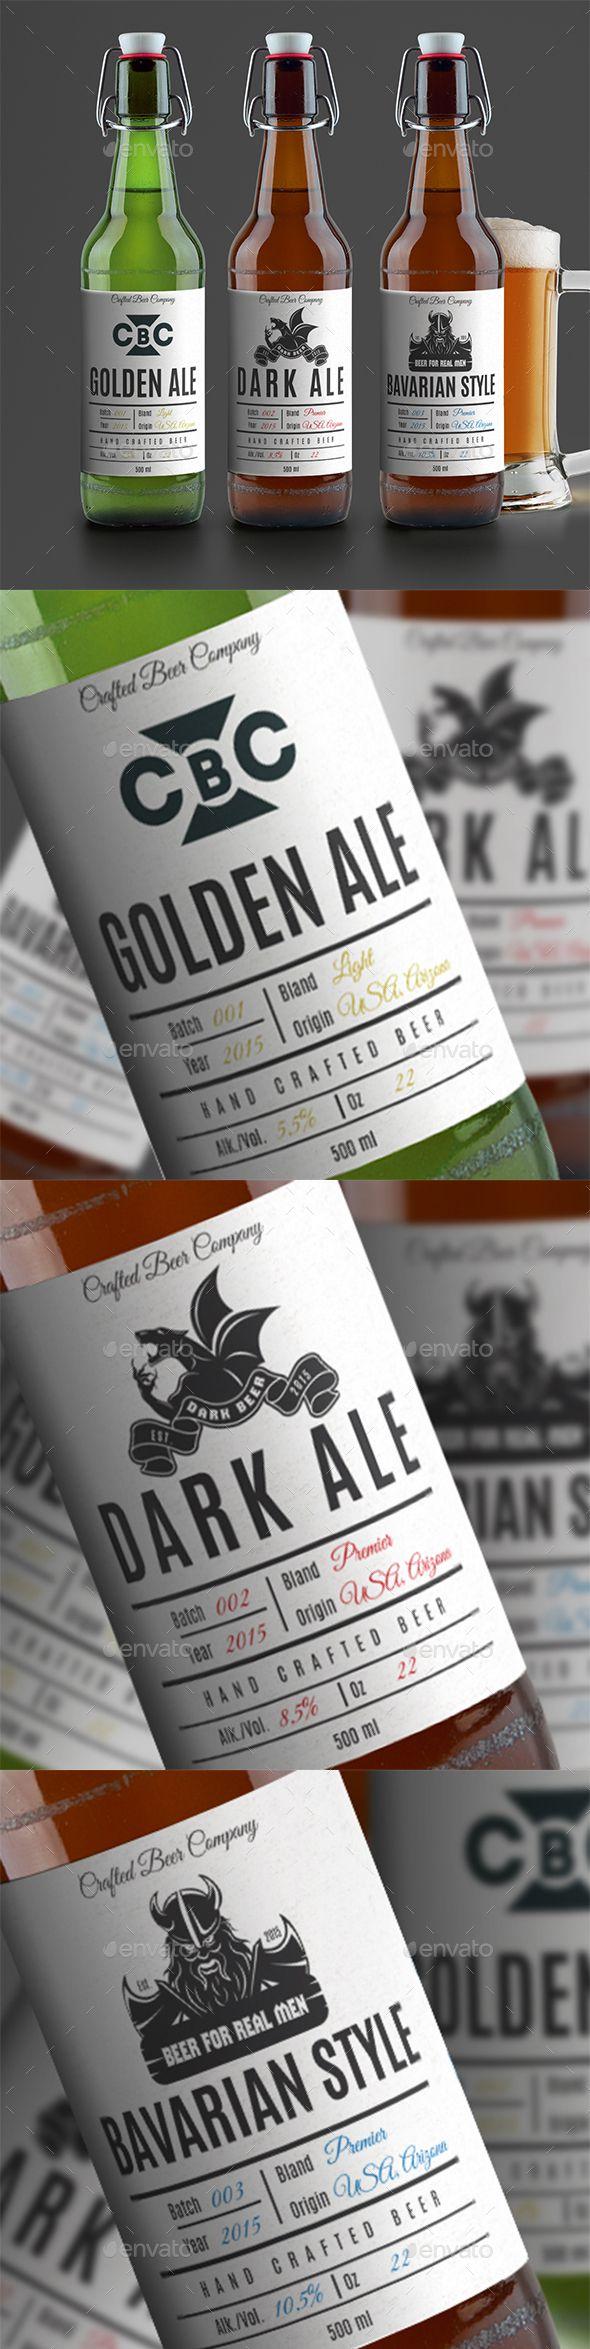 005 Fantastic Beer Bottle Label Template Word High Definition  FreeFull